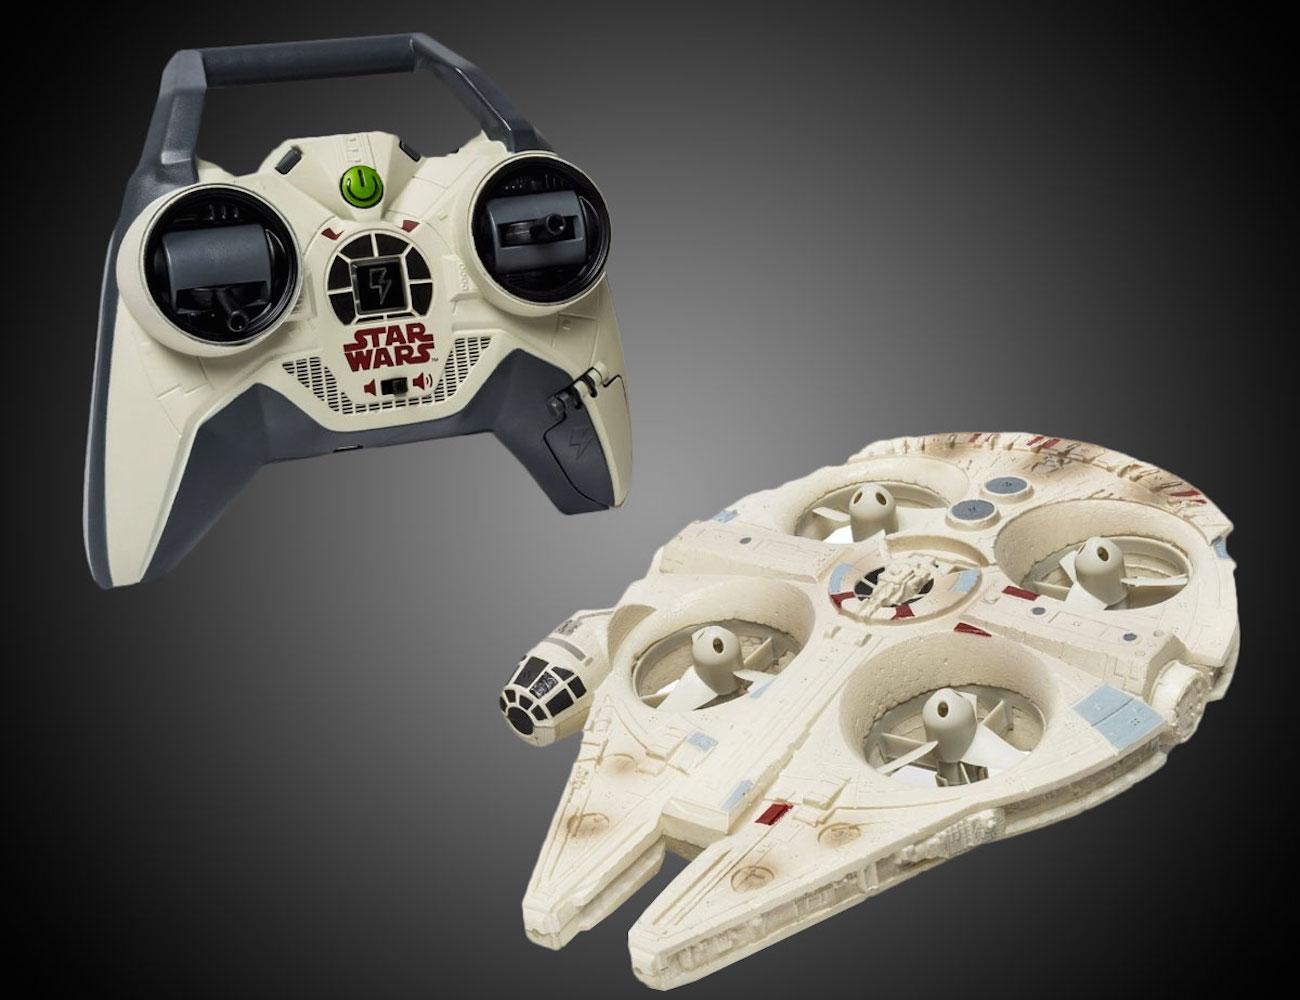 Star Wars Millennium Falcon Drone